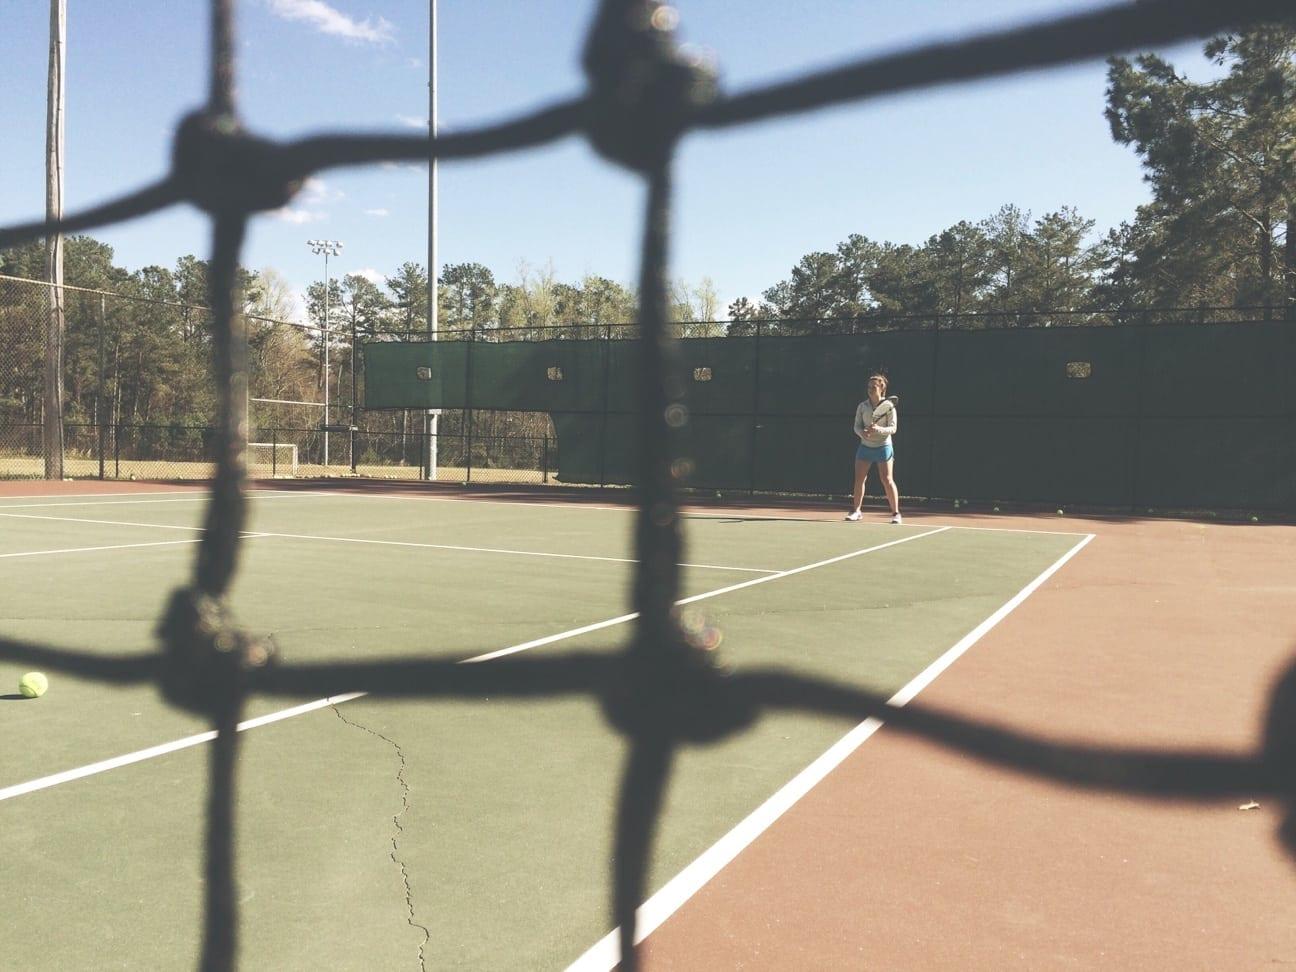 Jefferson High School tennis player trains hard, plays hard